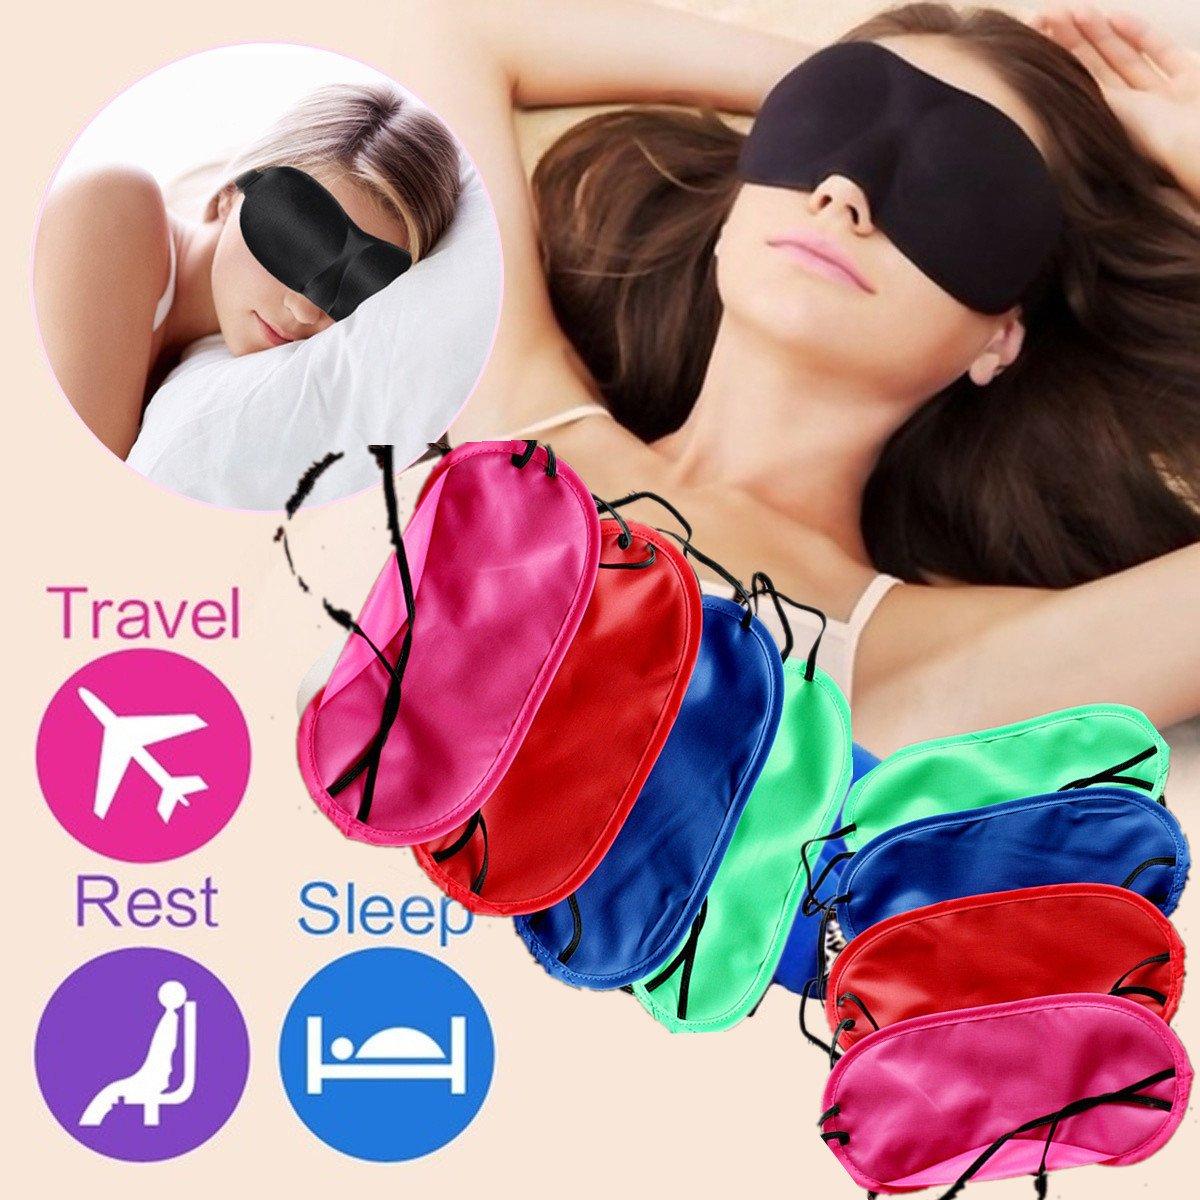 Jeeke Pure Silk Eye Mask Cute Expression Travel Sleep Mask for A Full Night's Sleep (Black, 19cmx8.5cm)